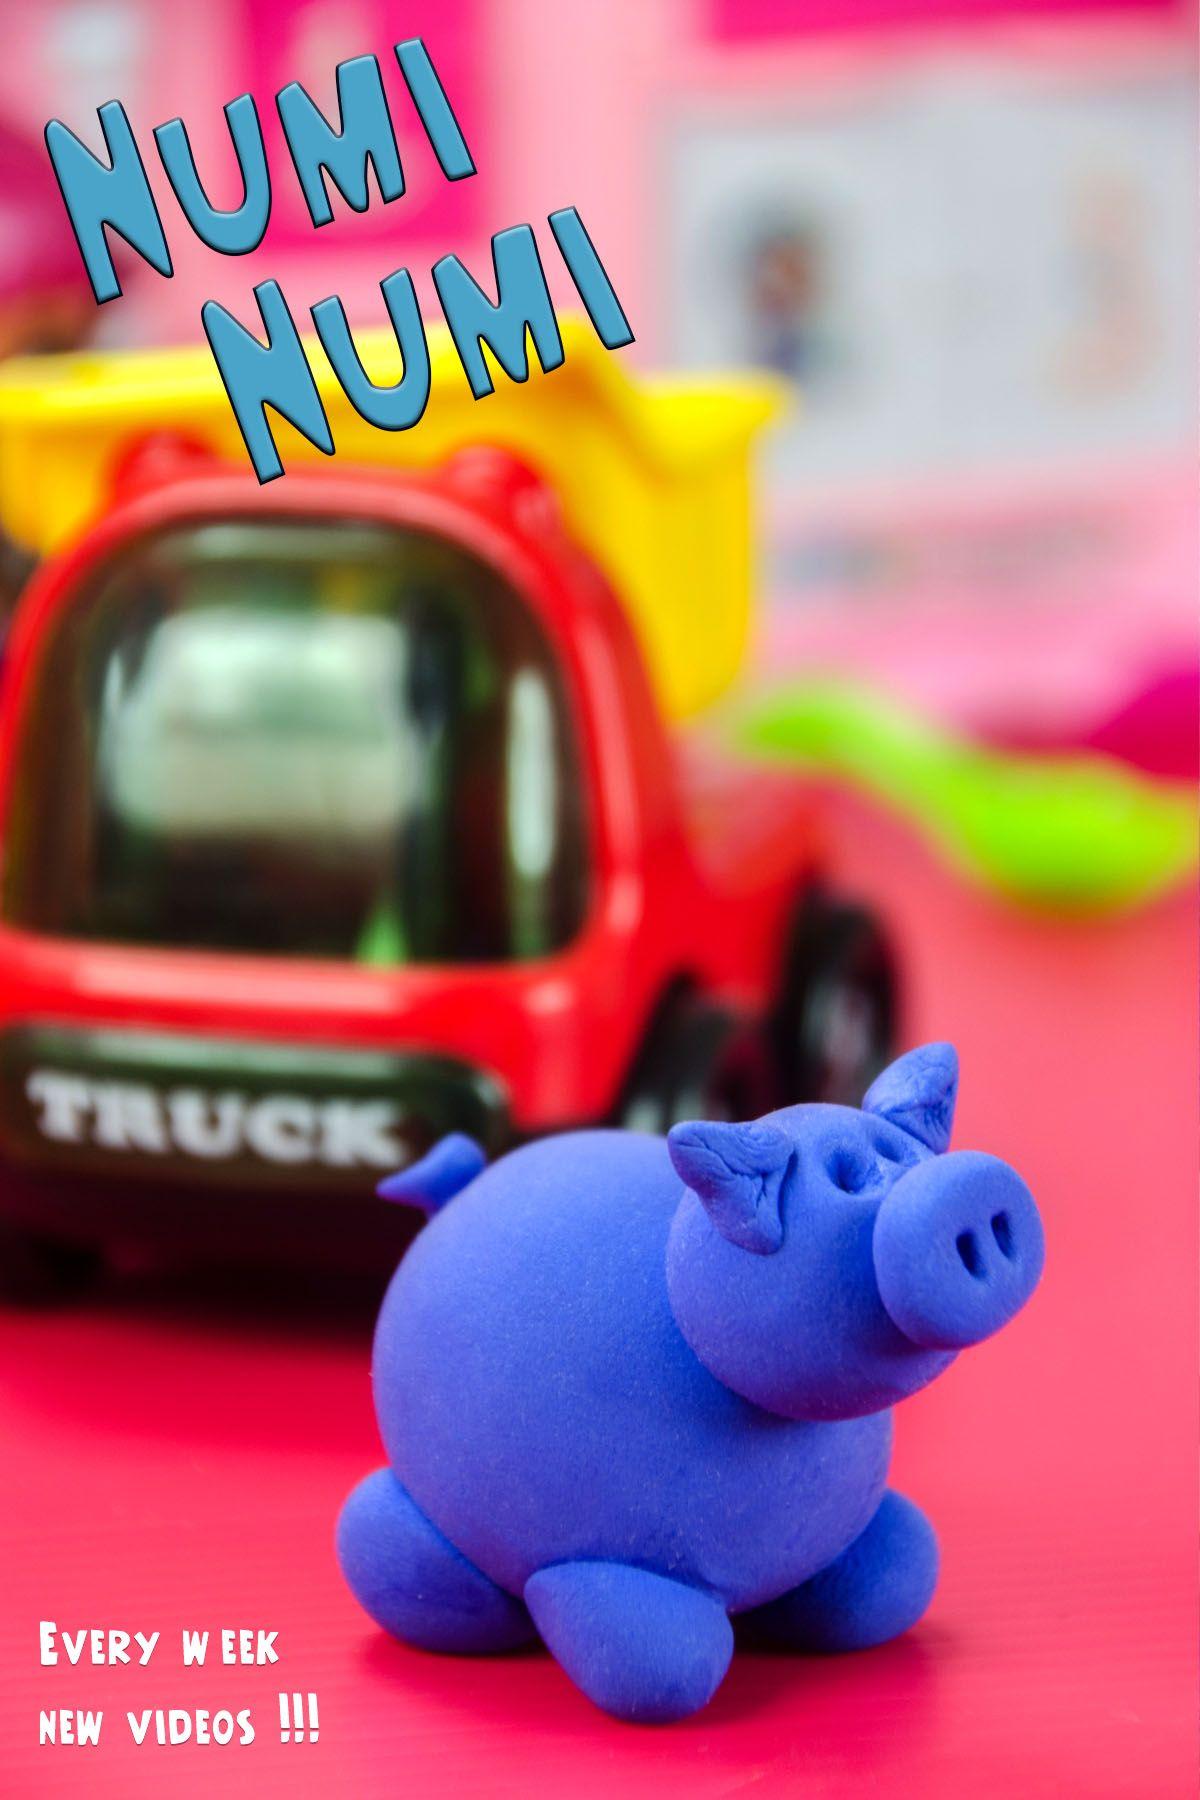 Clay Tutorial - Pig Crafts | Pig crafts, Clay tutorials ...